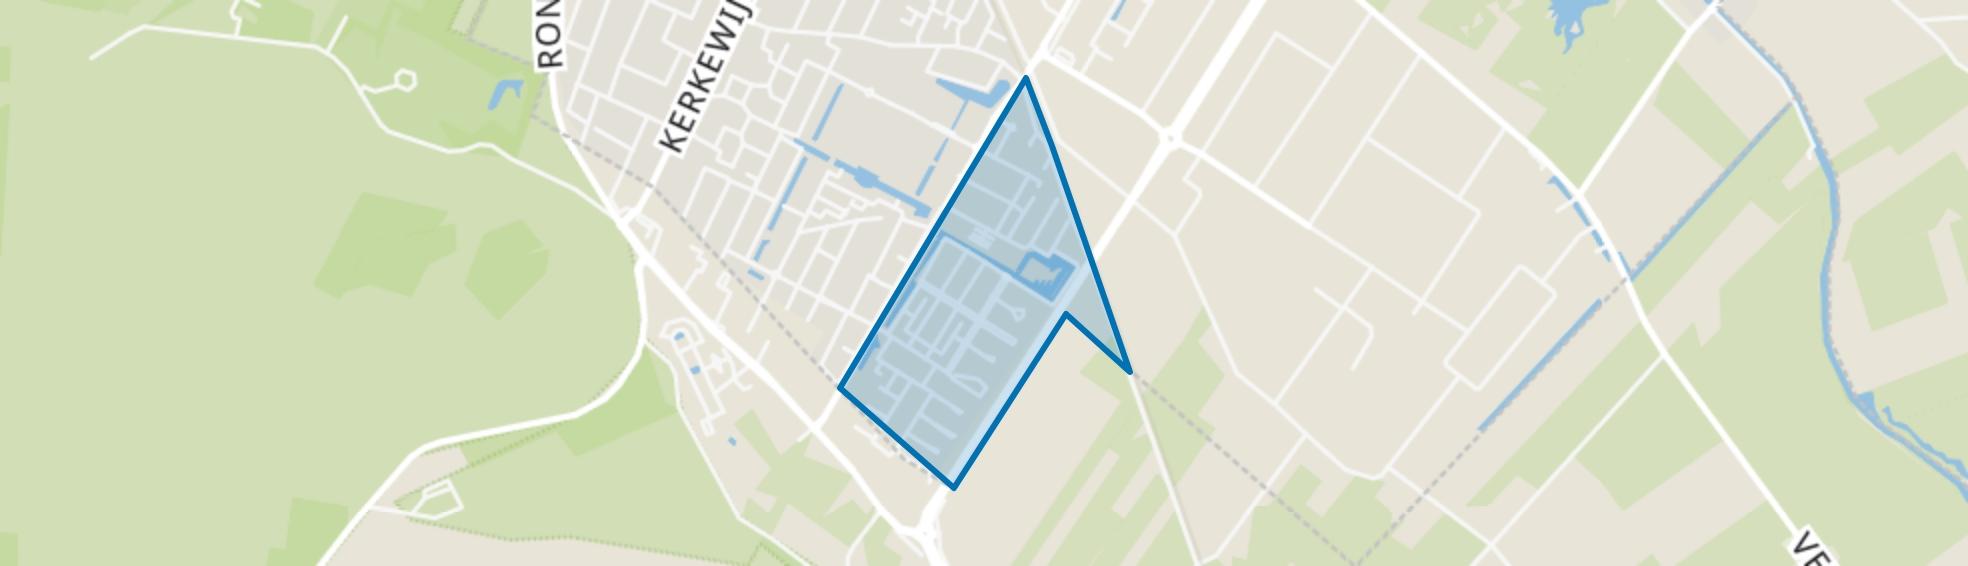 Petenbos-Oost, Veenendaal map